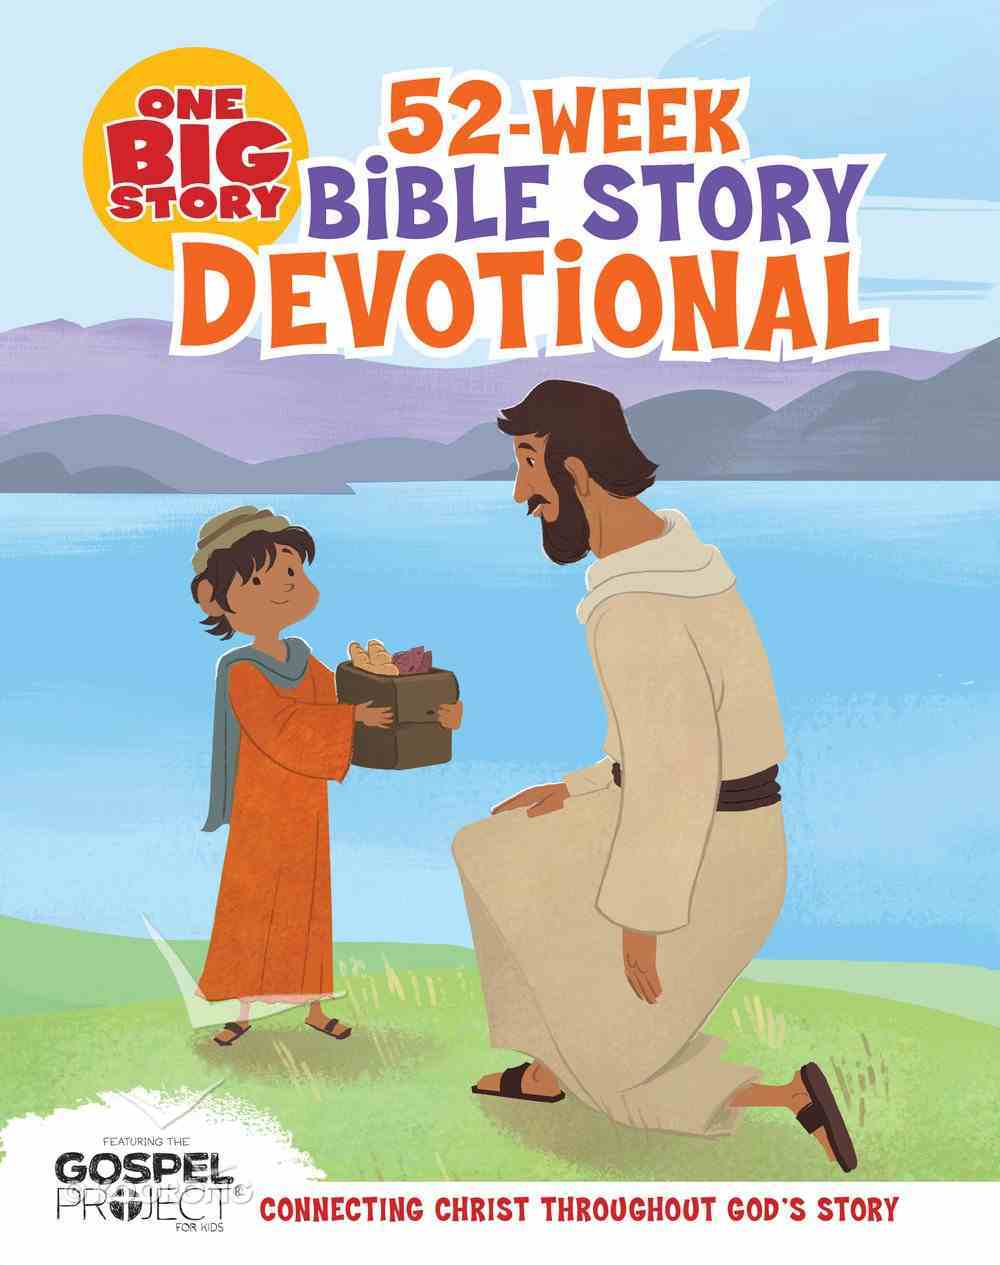 One Big Story 52-Week Bible Story Devotional Hardback